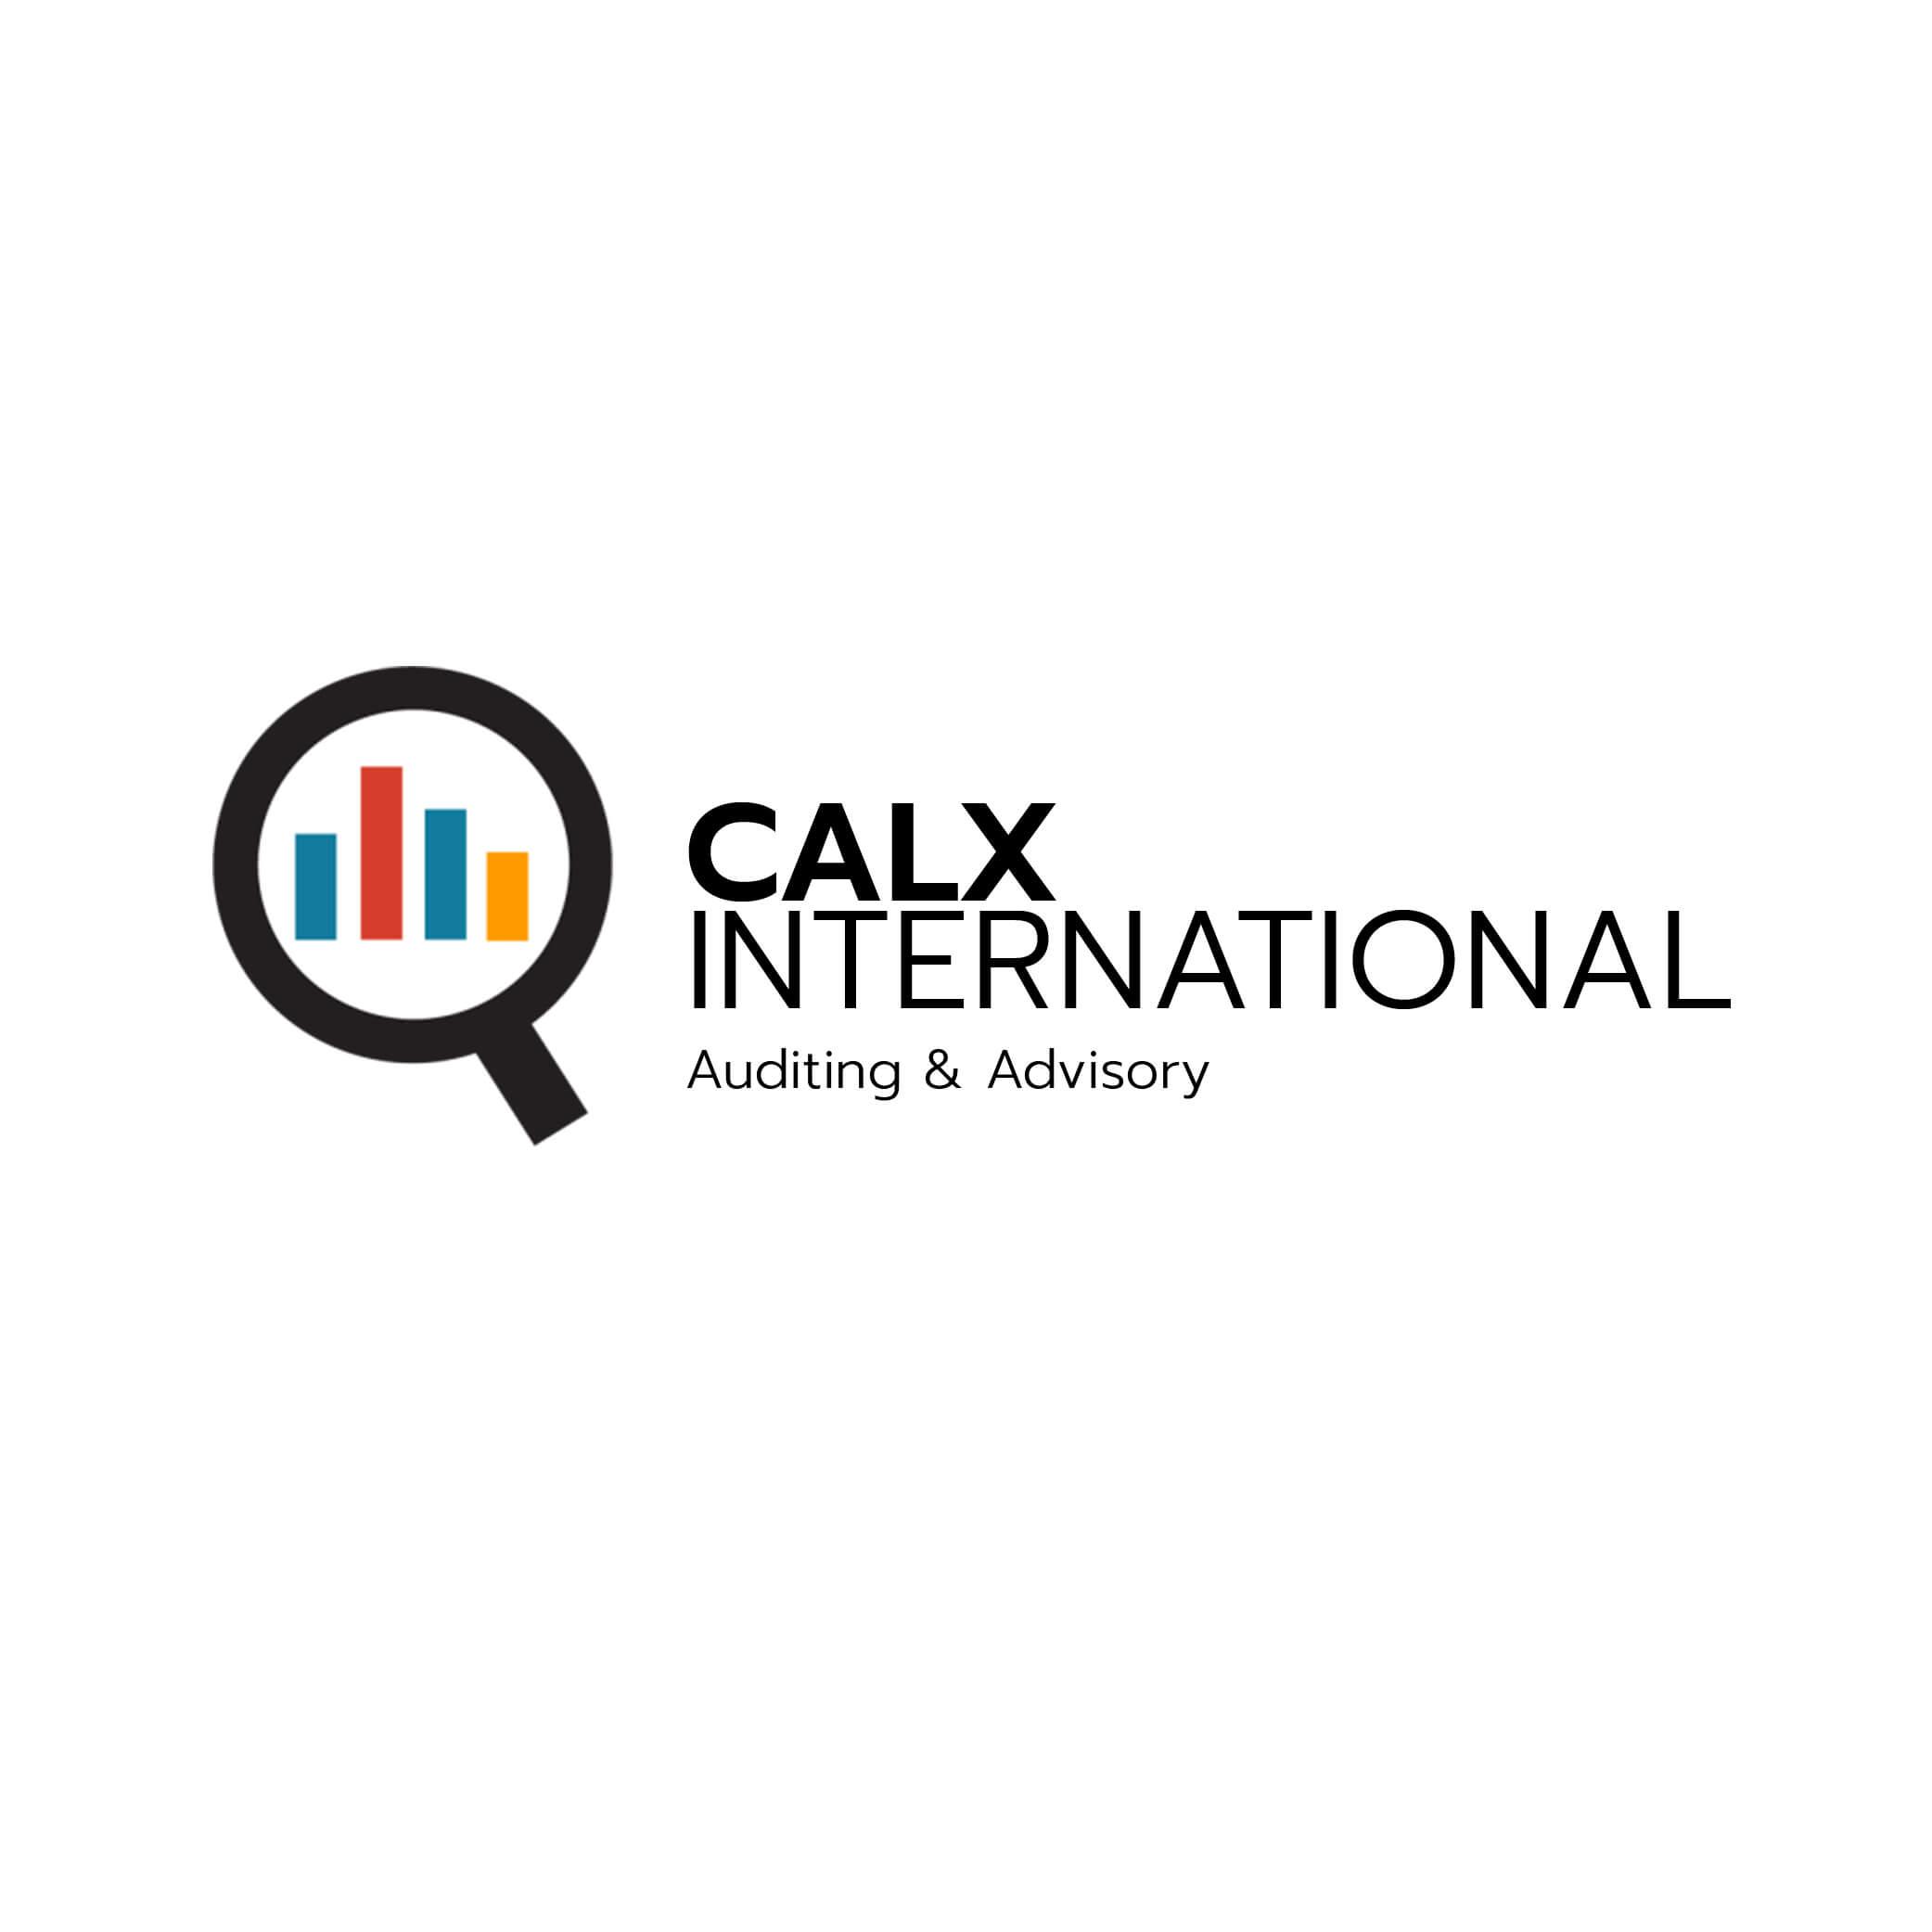 CALX International Auditing and Advisorys